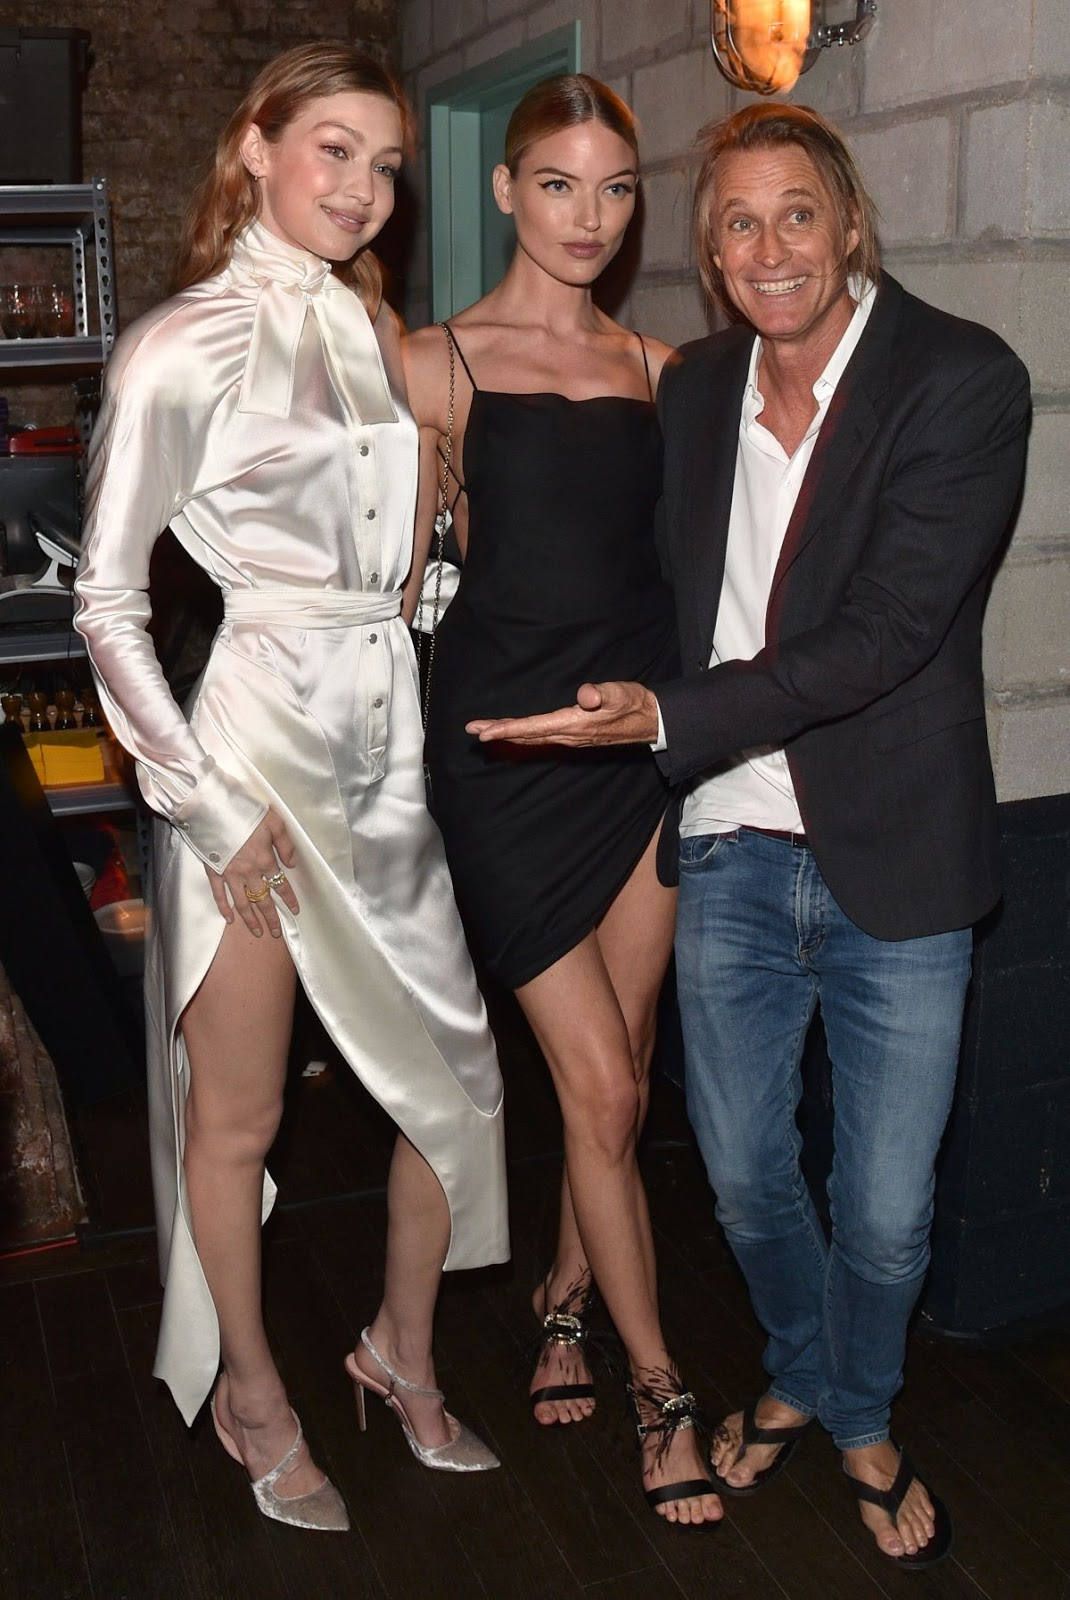 Gigi Hadid and Martha Hunt at Backstage Secrets